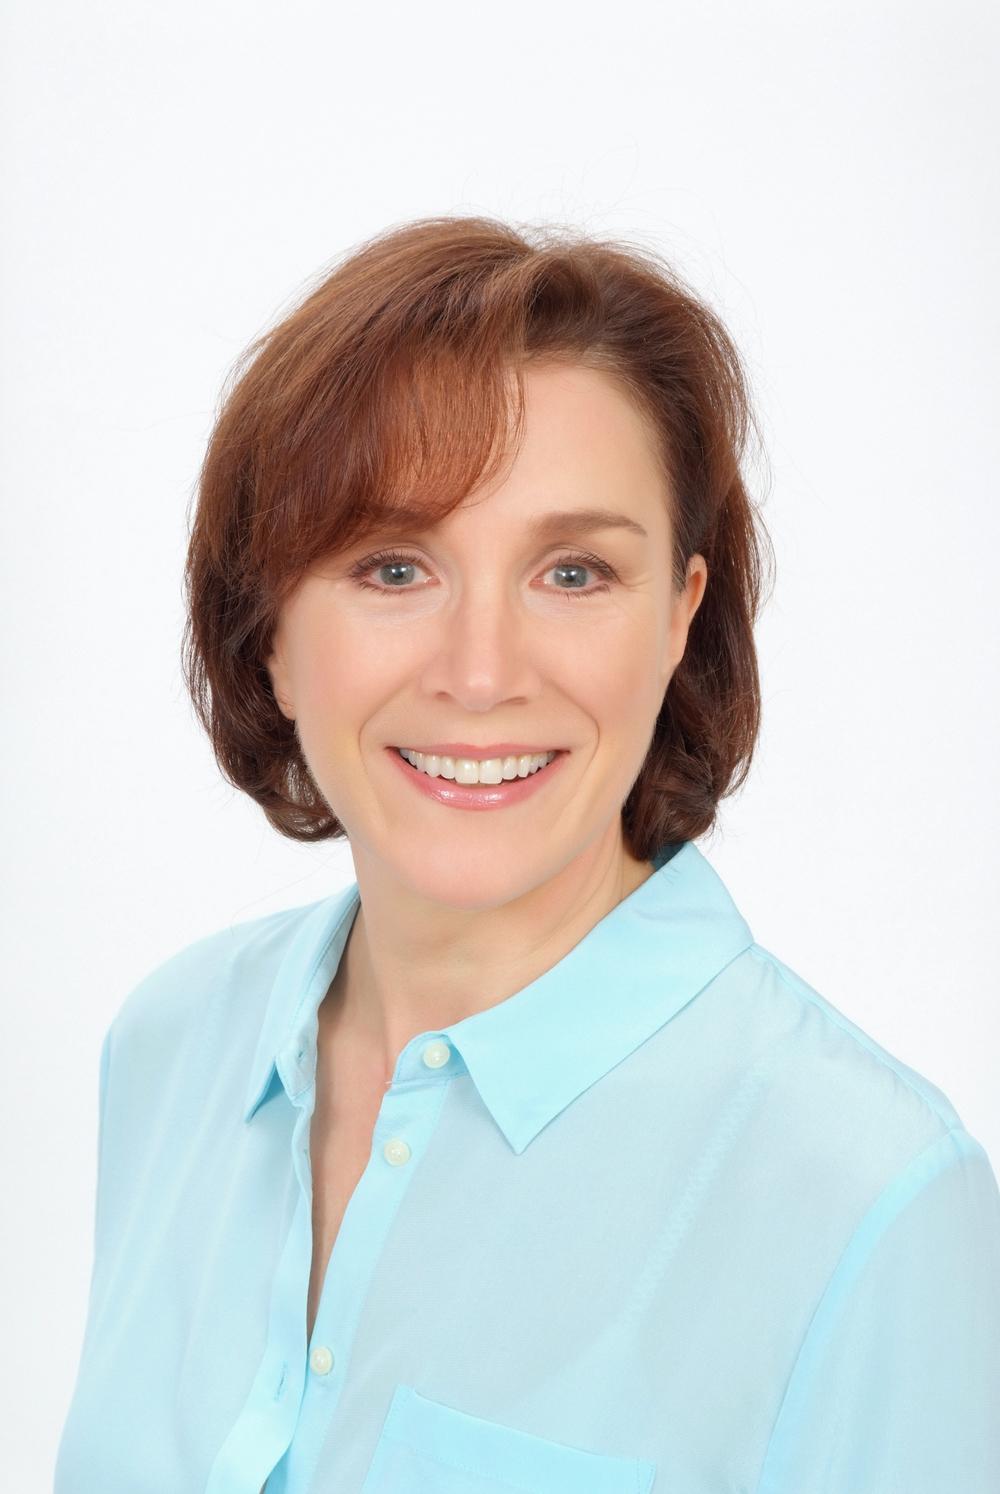 Cathy Huser, Owner/Director Licensed Kindermusk Educator